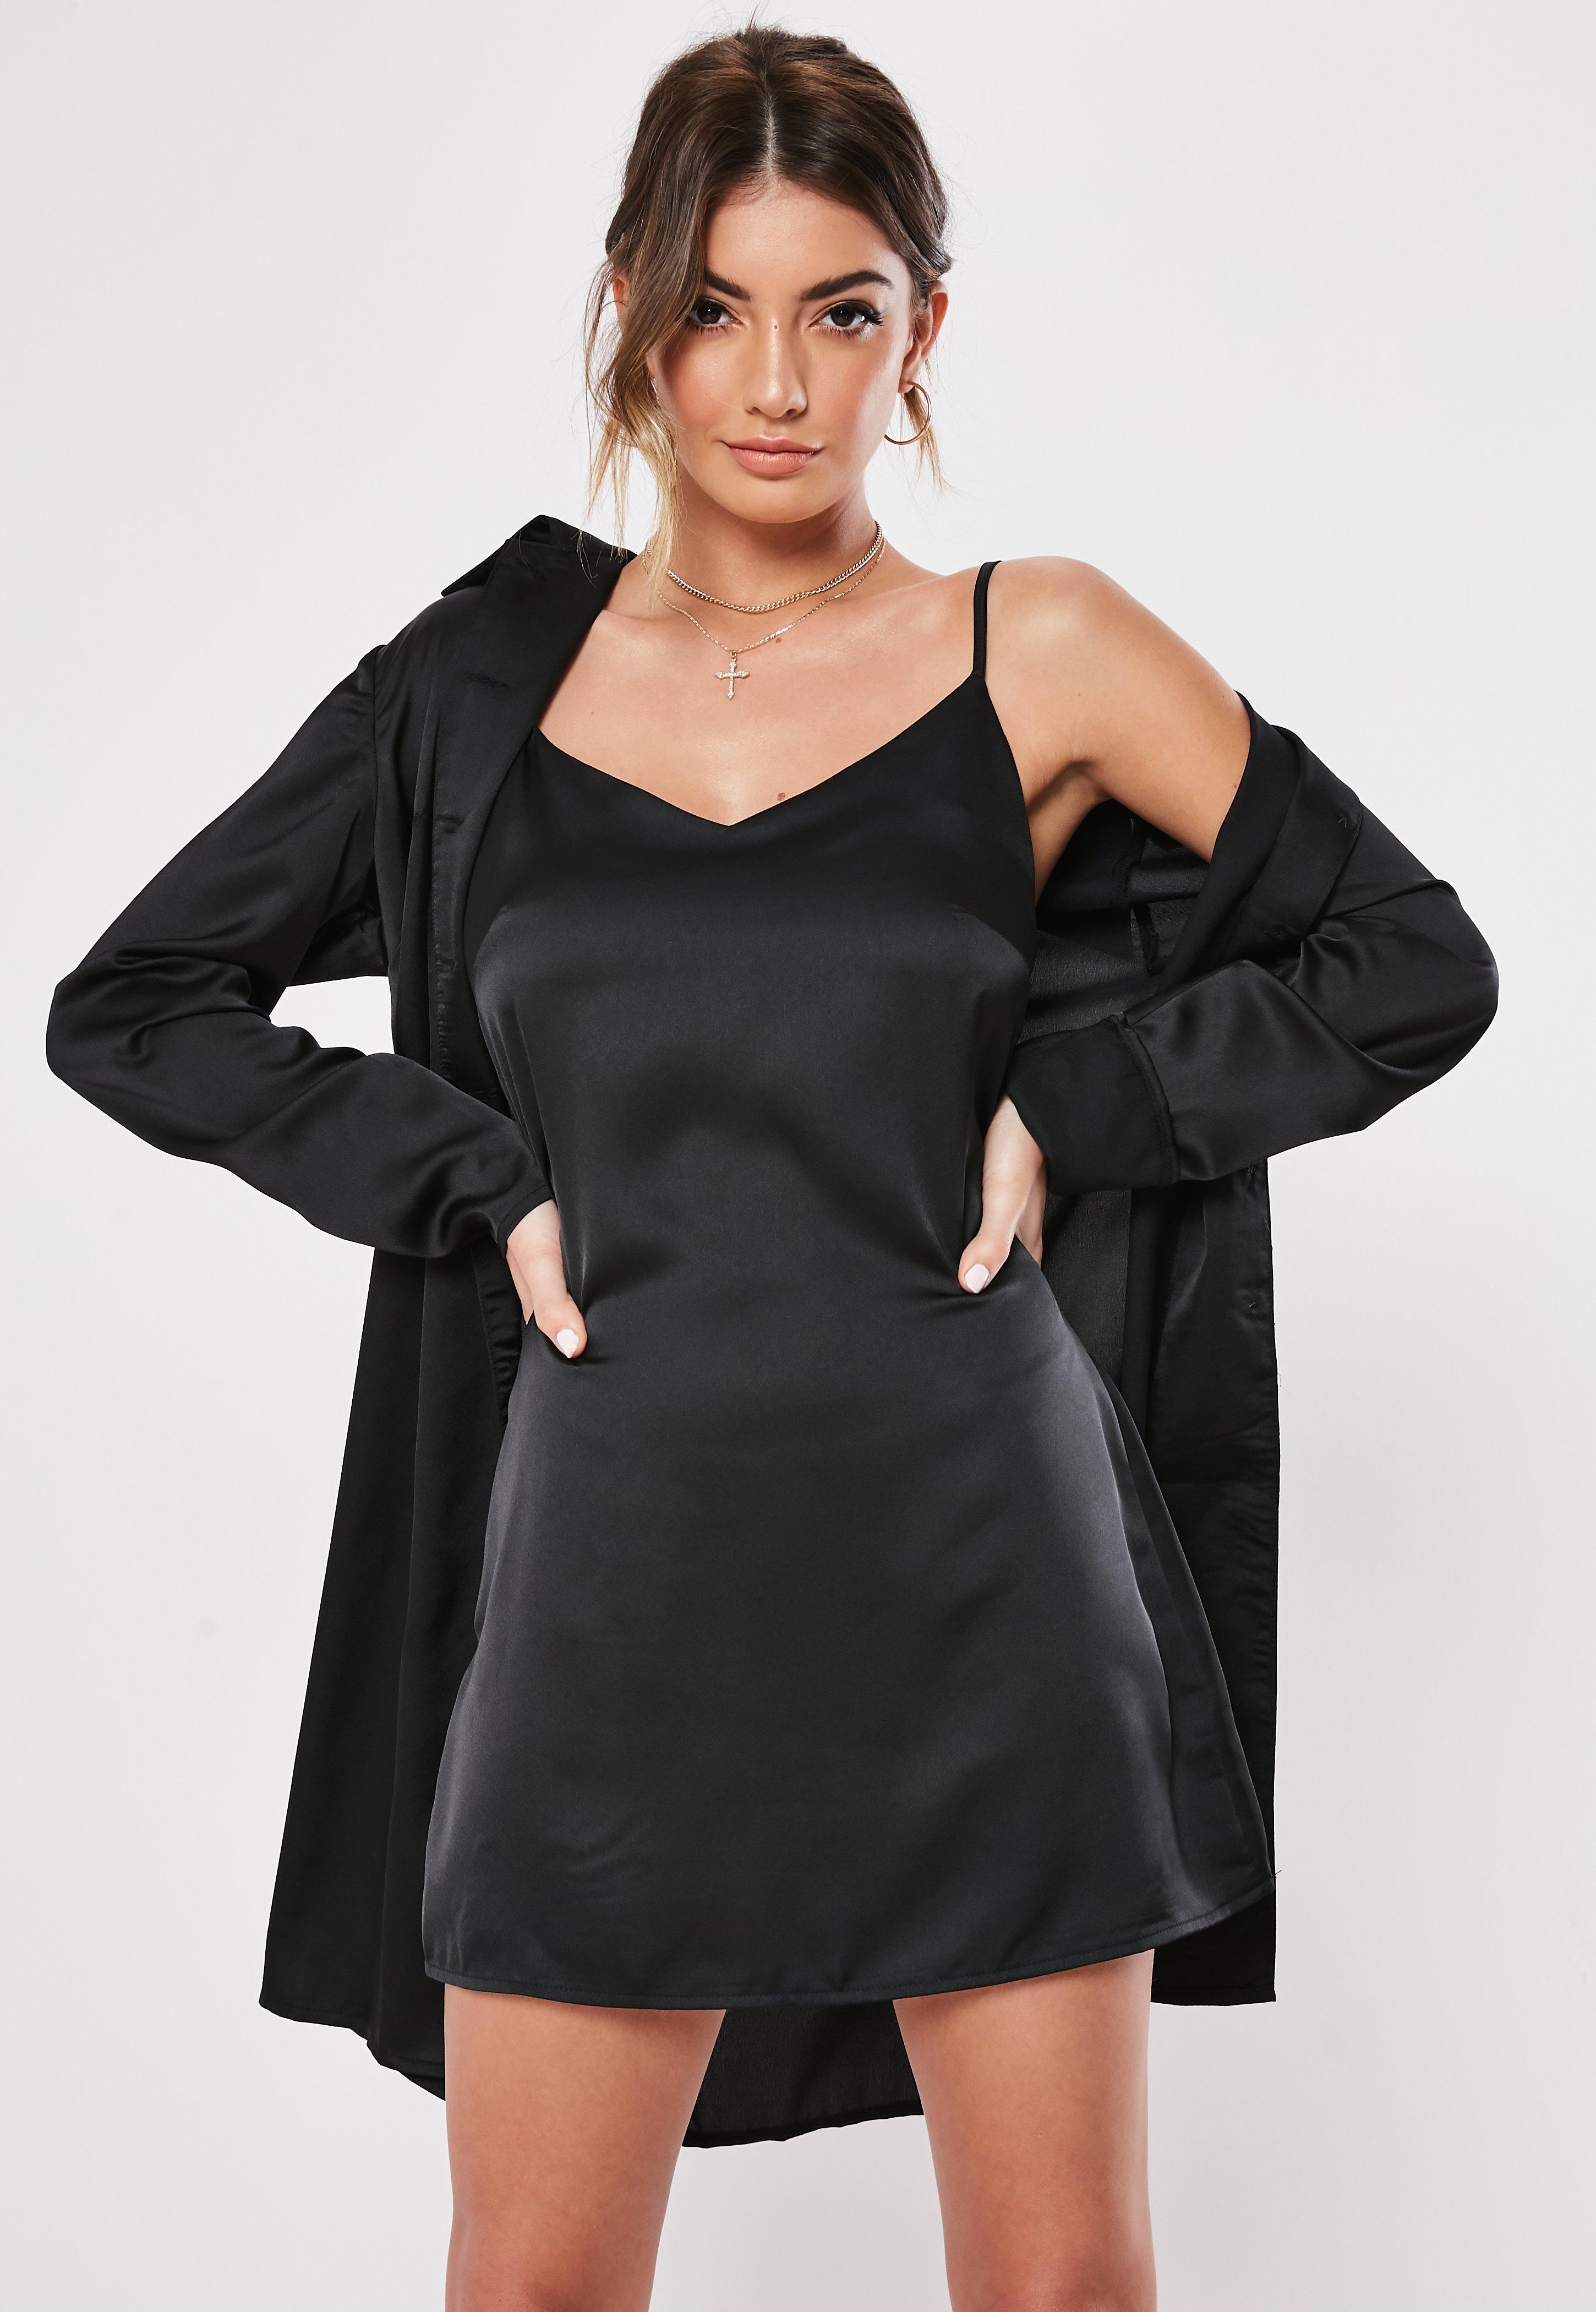 e3bc49c885 Little Black Dresses